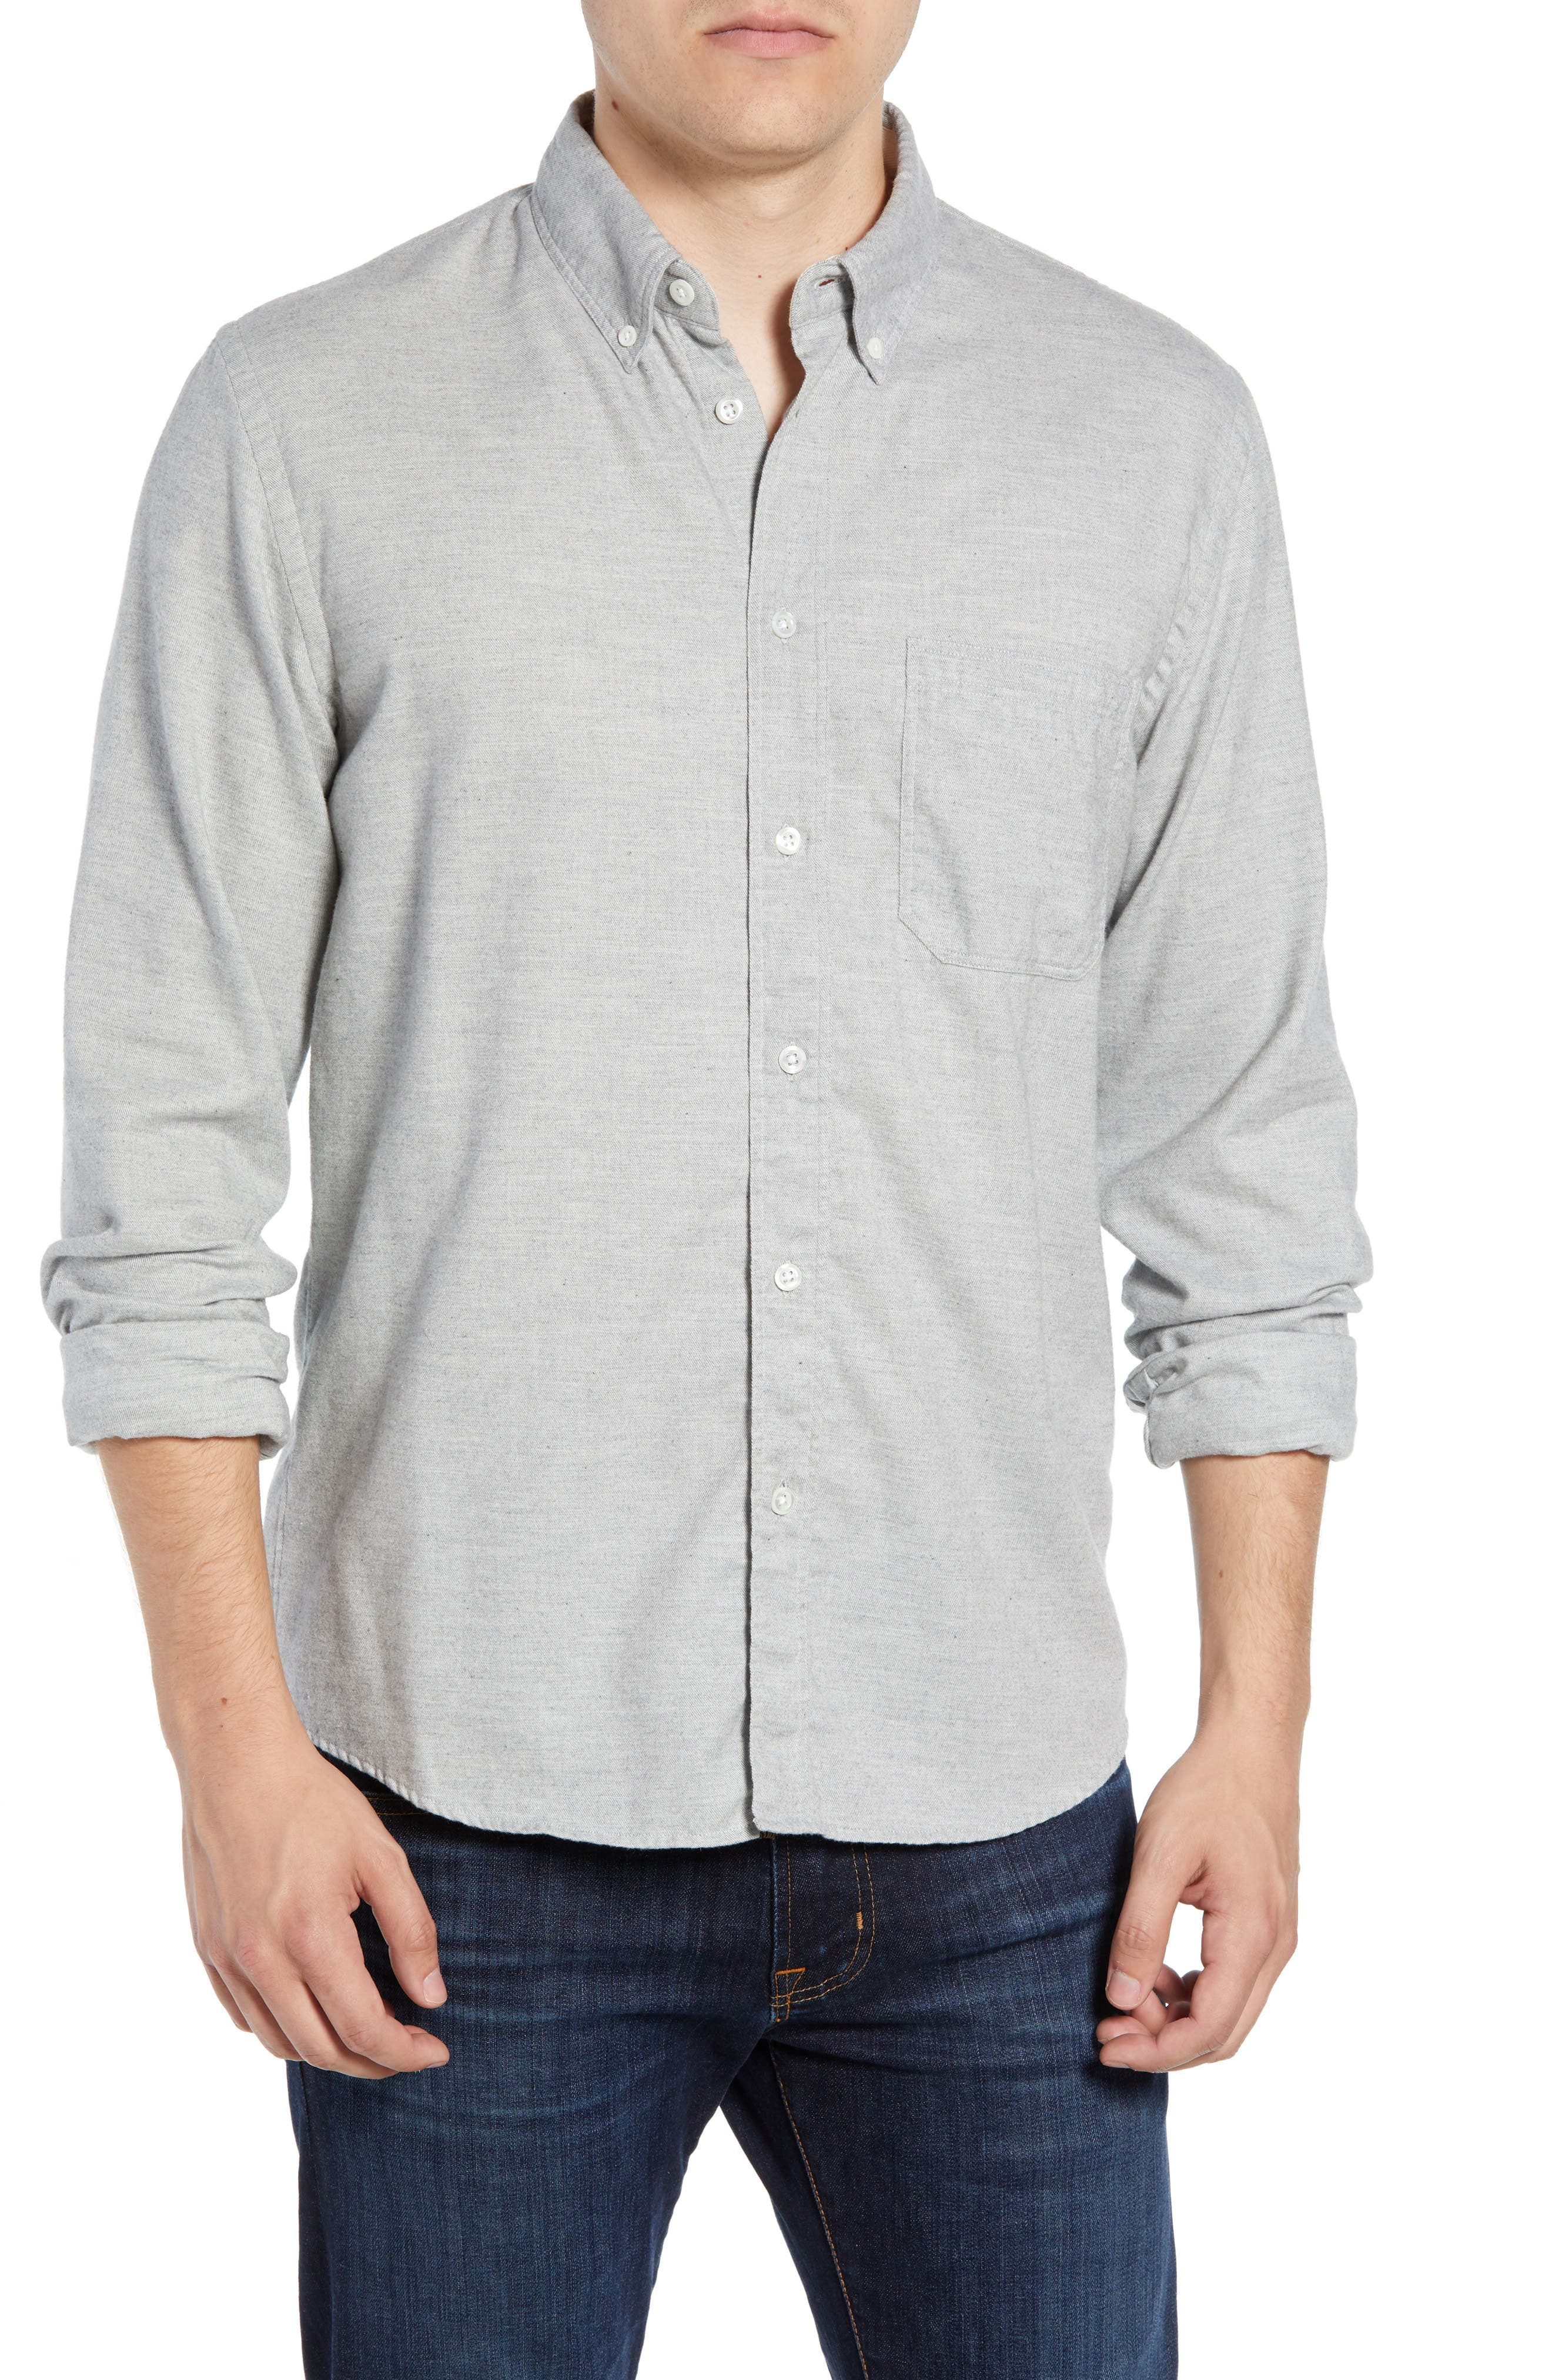 Tuscumbia Regular Fit Sport Shirt,                             Main thumbnail 1, color,                             LIGHT GREY